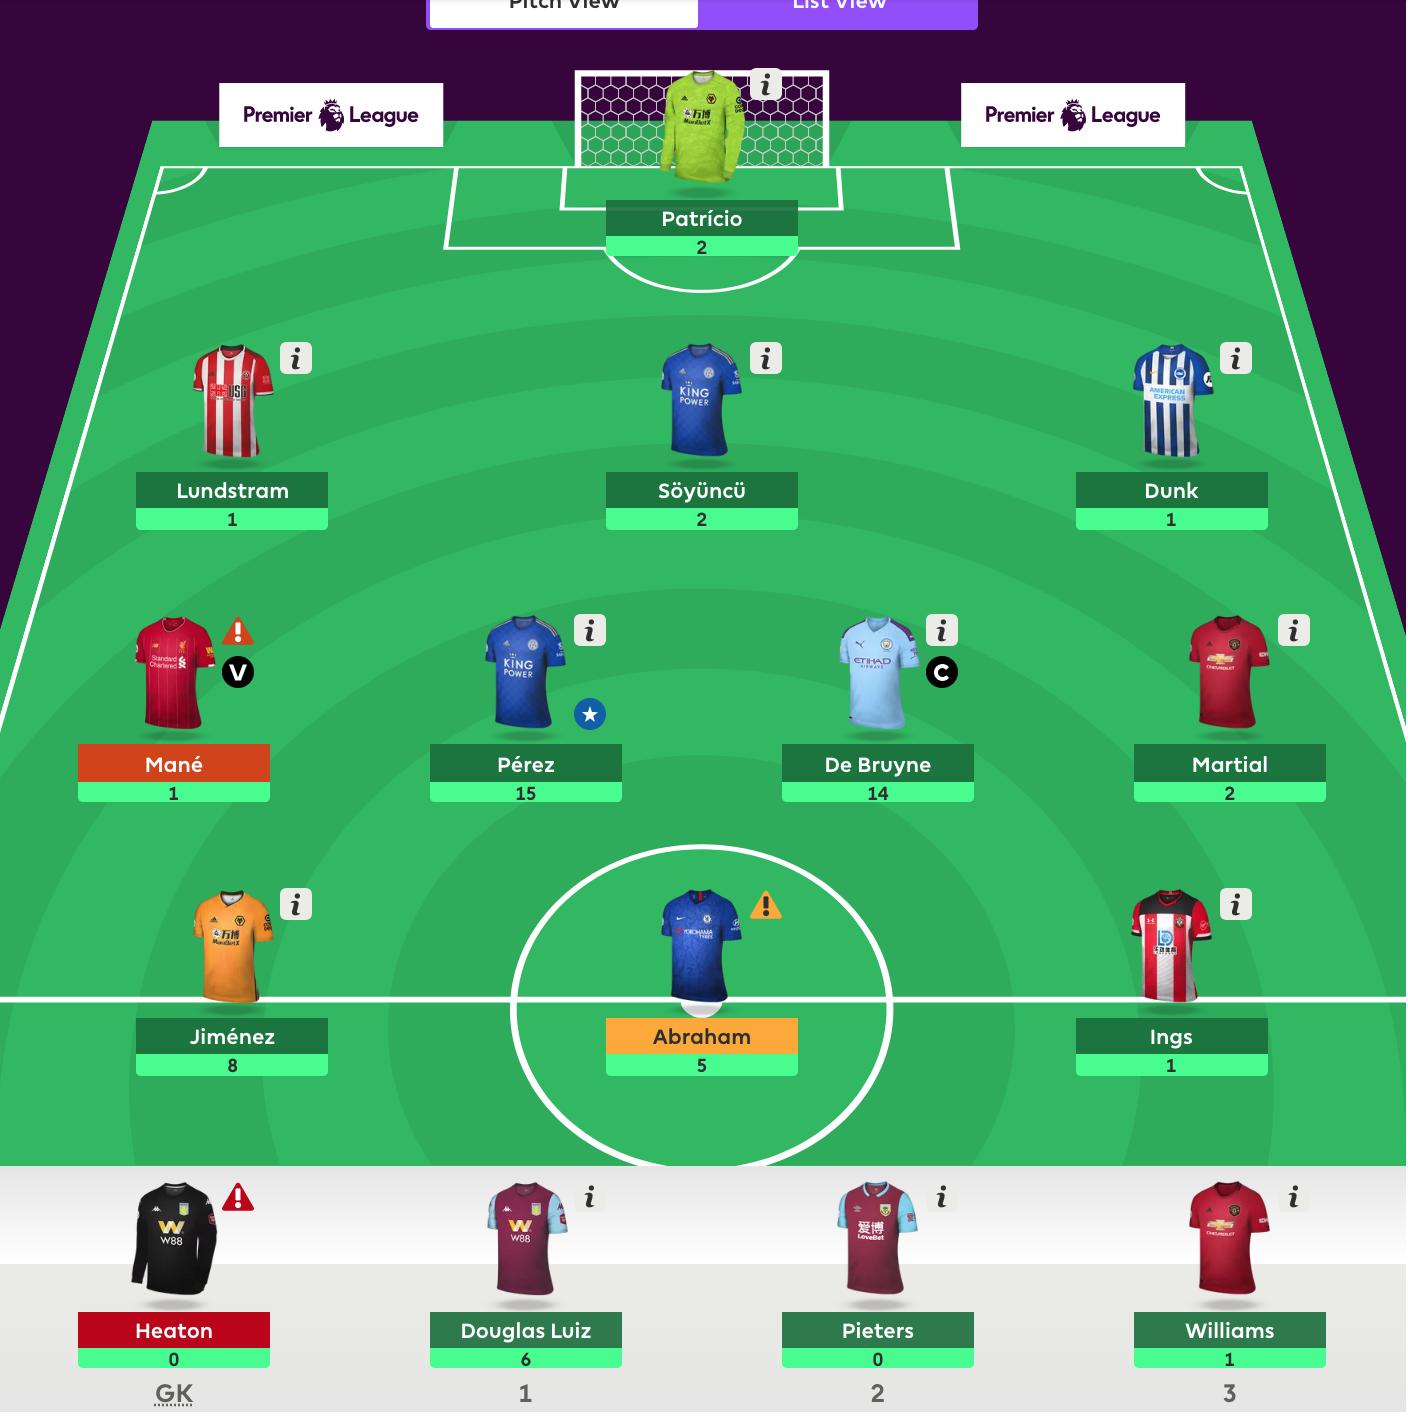 Fantasy Premier League 2019 - 2020 viikko 25